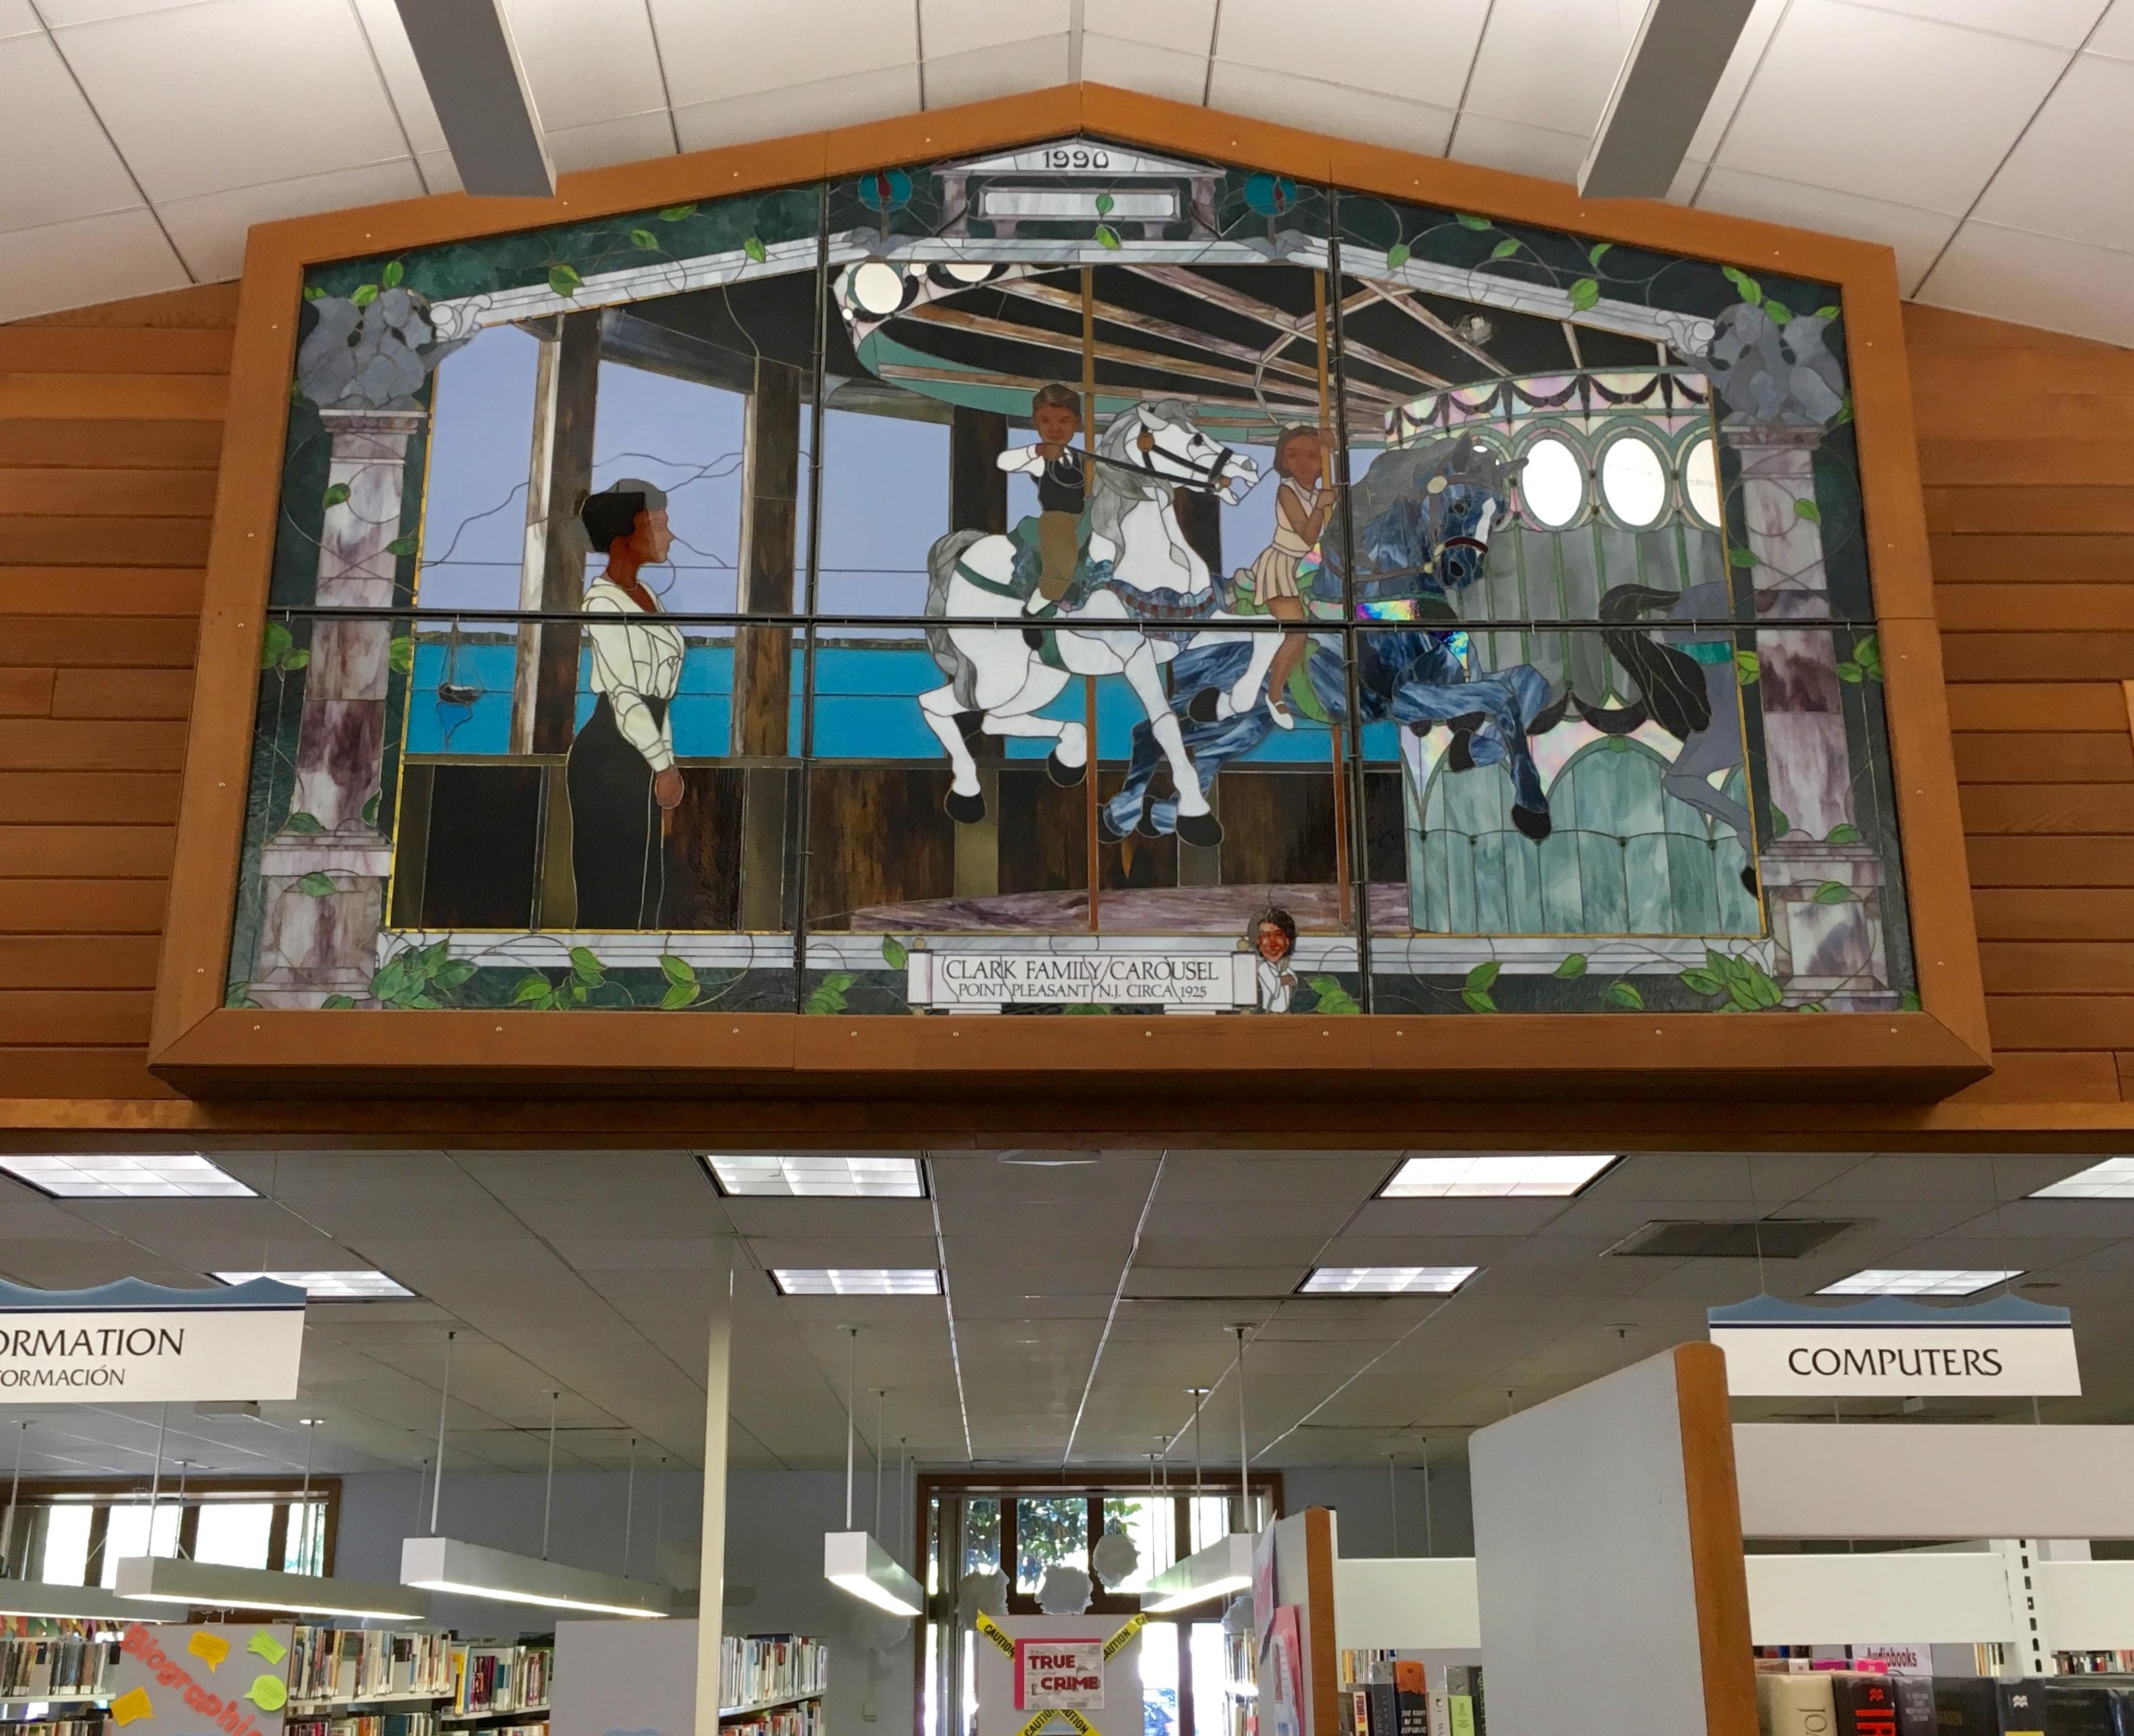 Pt. Pleasant Library